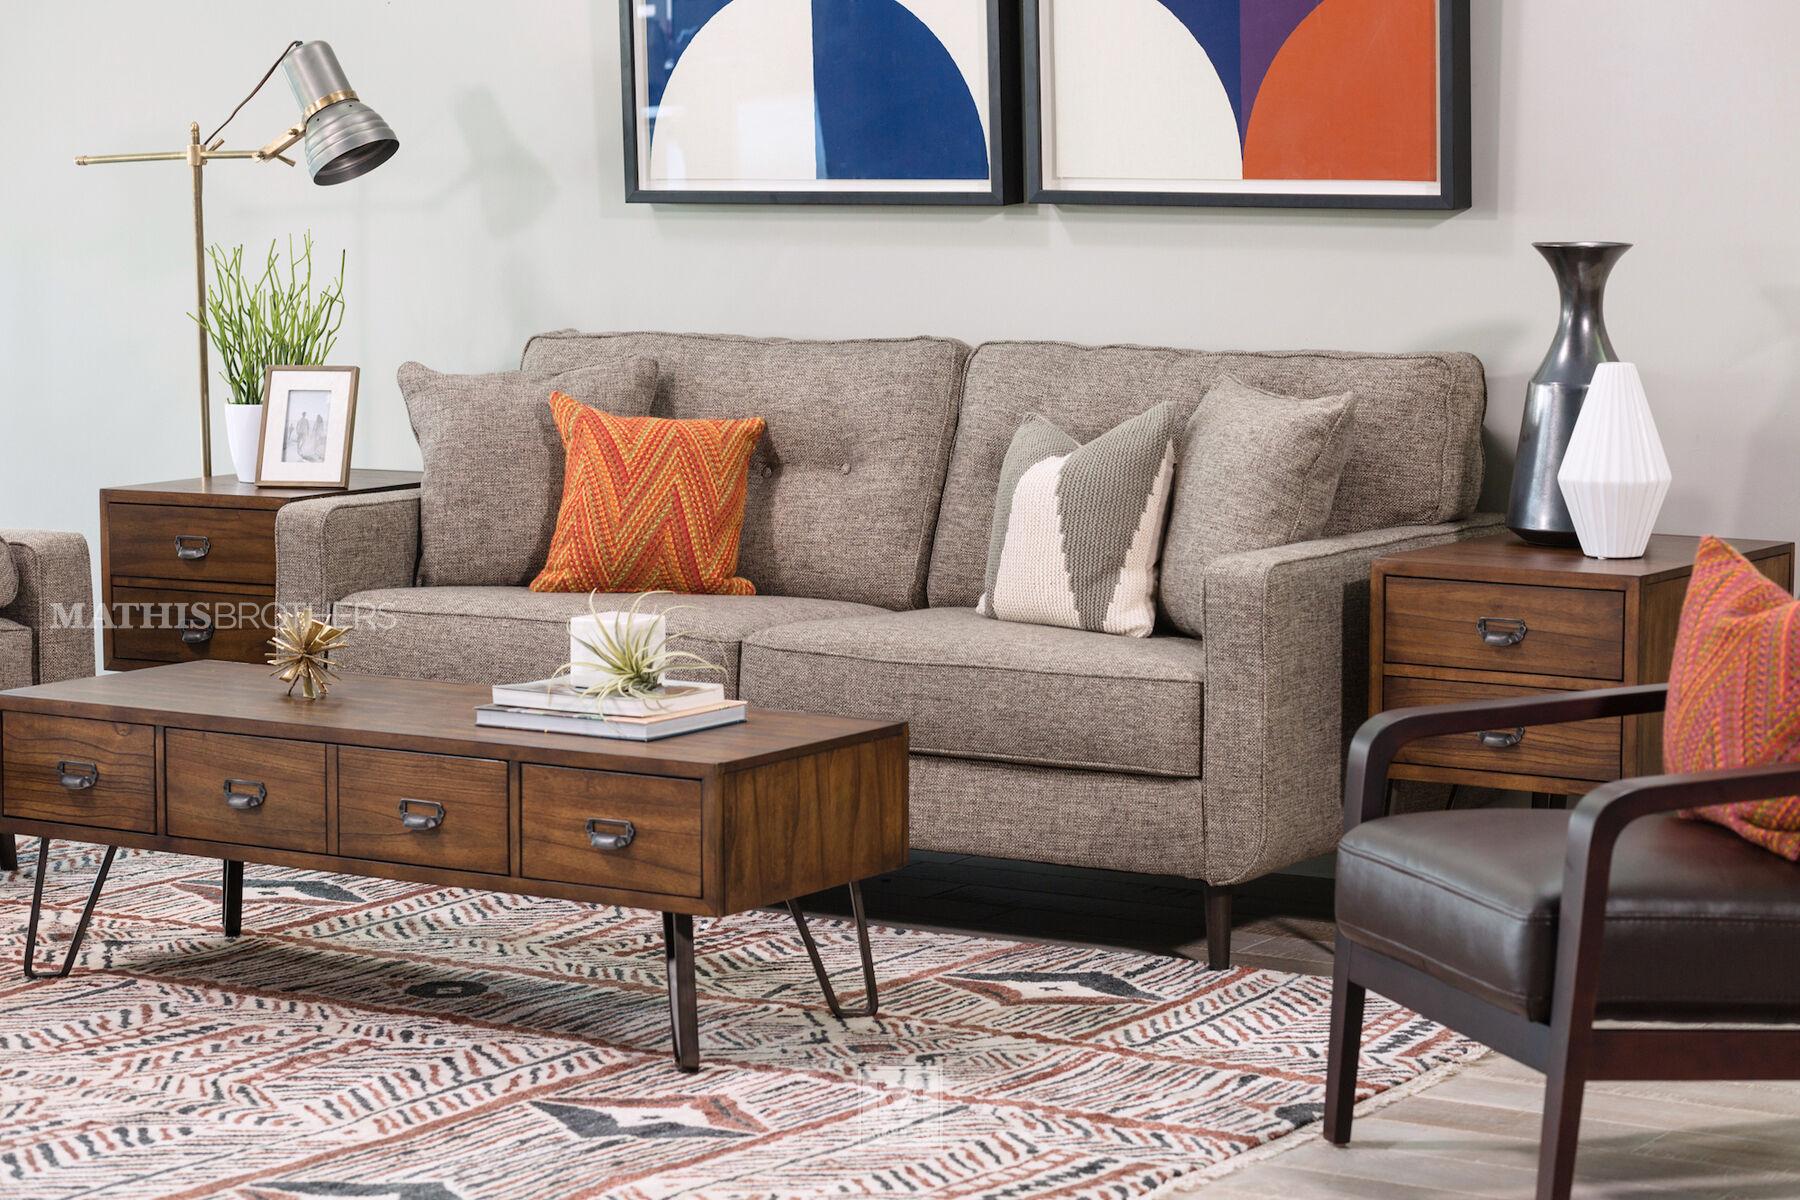 ... Modern Button Tufted 79u0026quot; Sofa In Jute